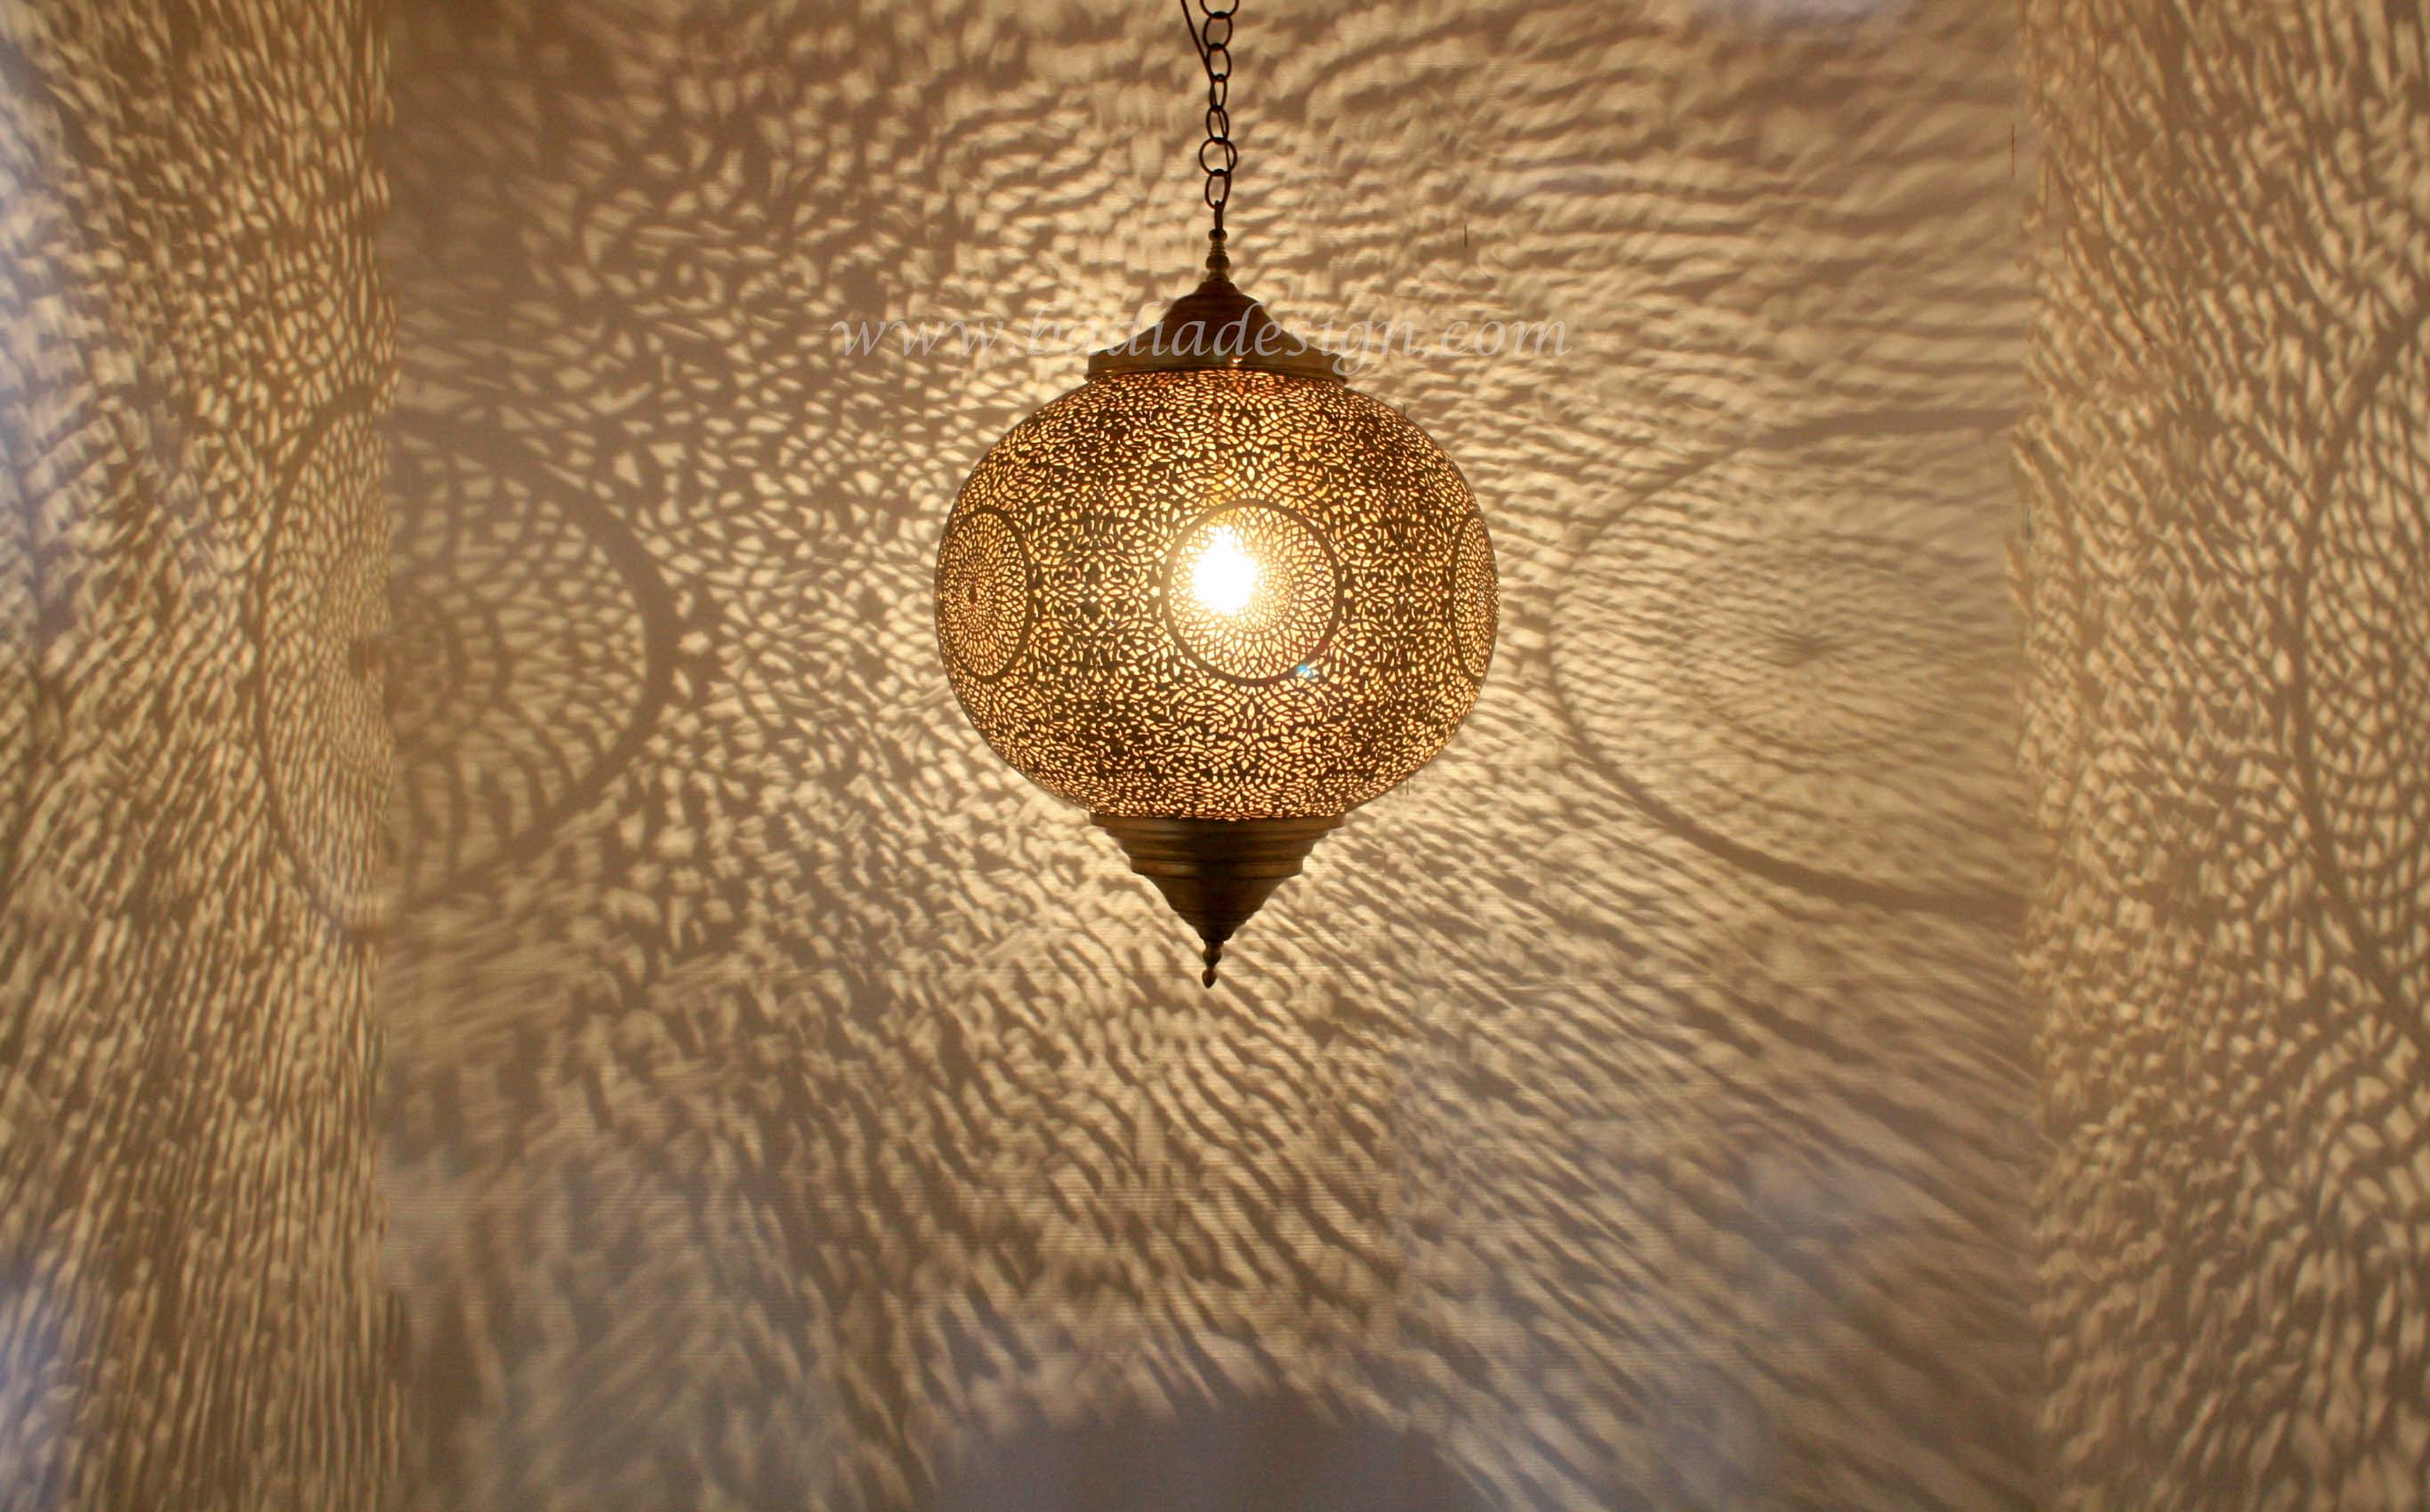 moroccan-round-brass-ceiling-light-fixture-lig274-1.jpg